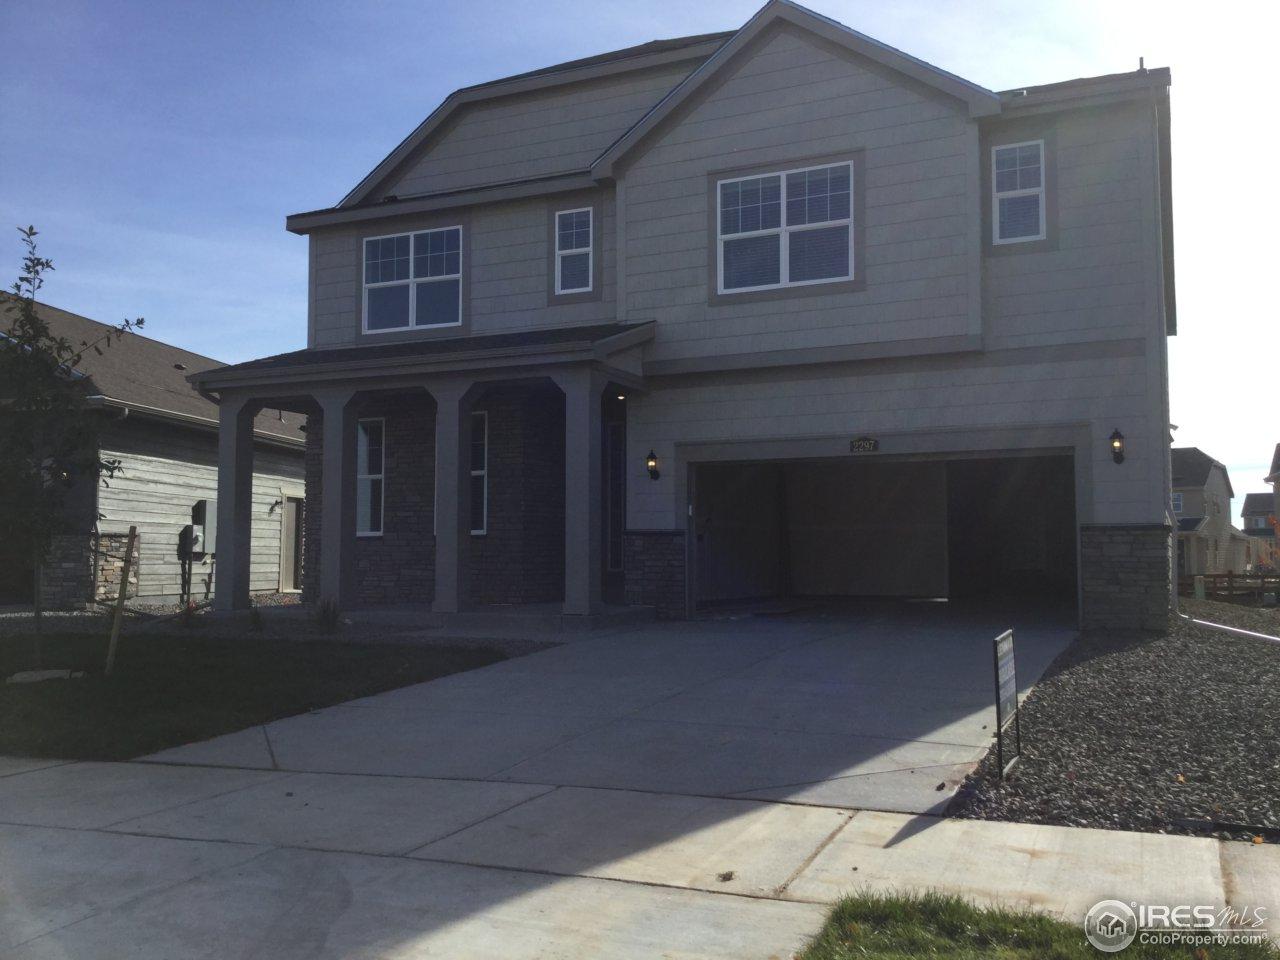 2297 Spotswood St, Longmont, CO 80504